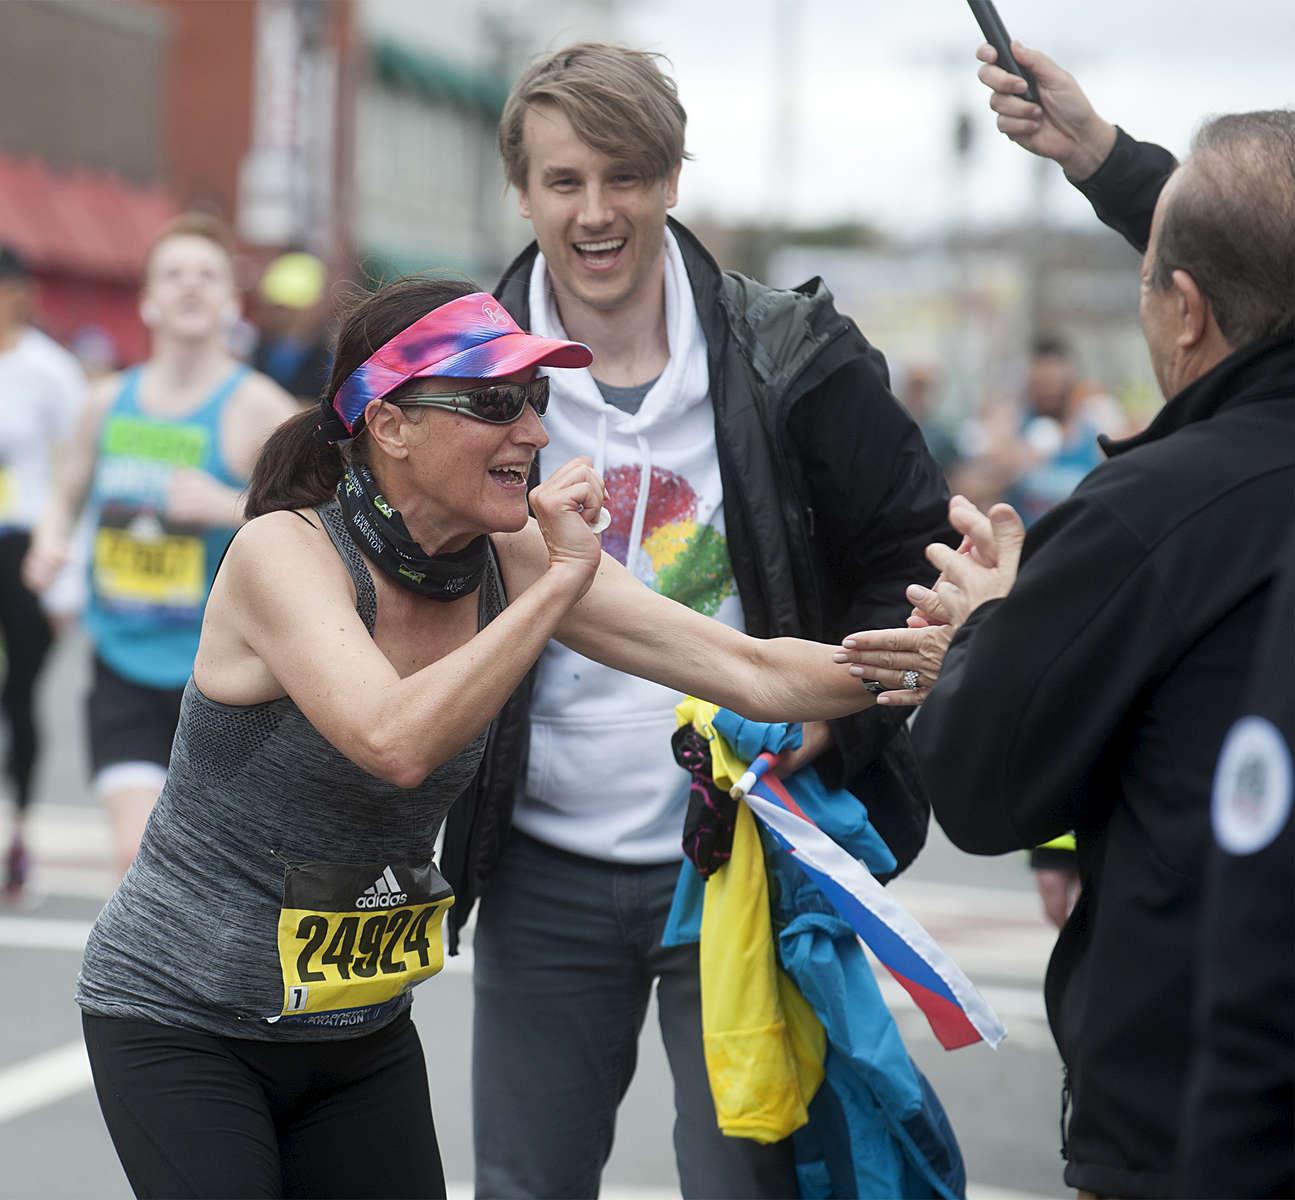 Boston Marathon runner Edna Cibej, of Slovenia, found her family waiting in Framingham: son Vid and husband Jadran. [Daily News and Wicked Local Staff Photo/Art Illman]